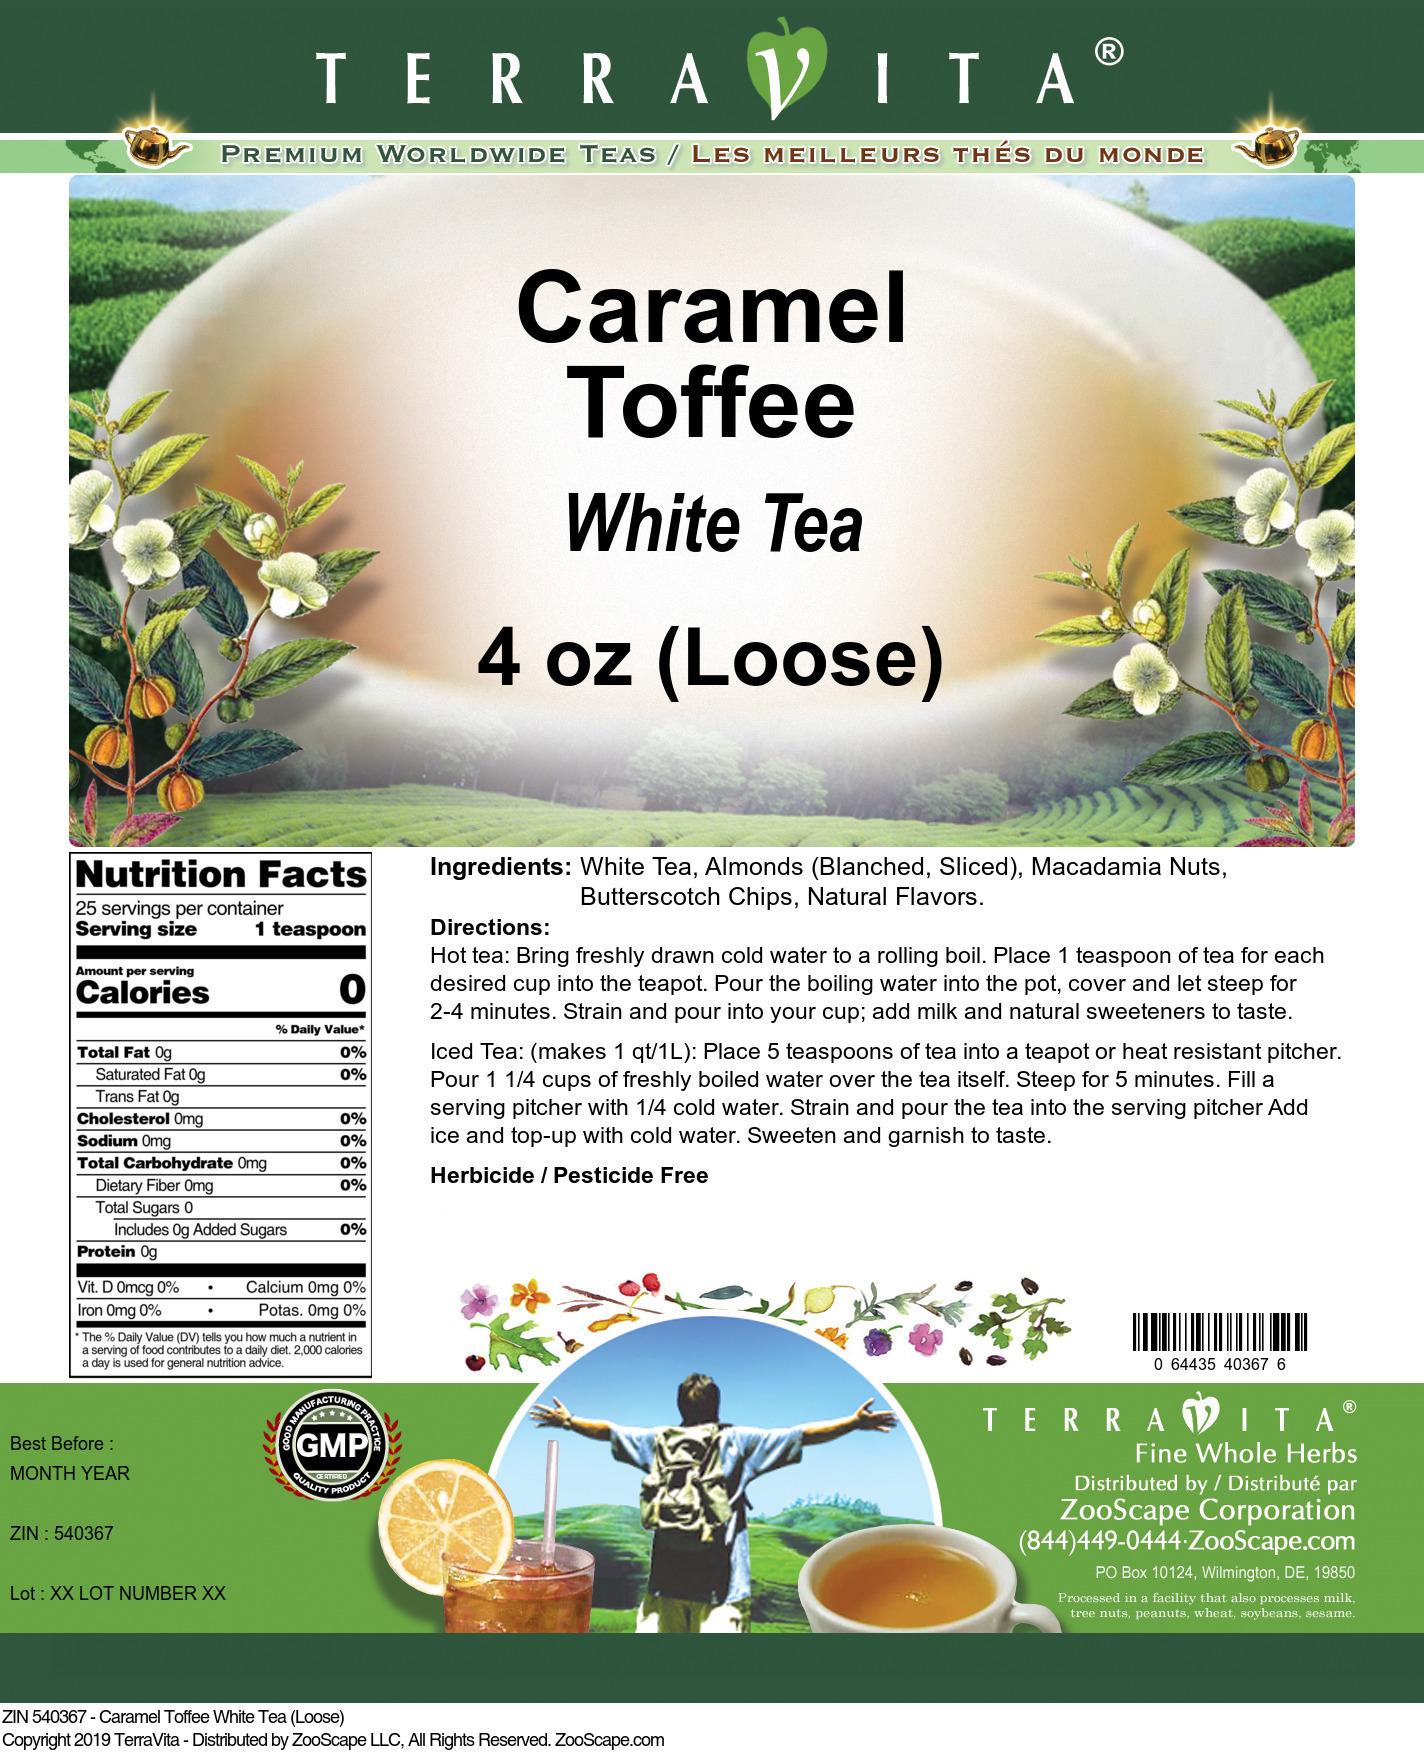 Caramel Toffee White Tea (Loose)